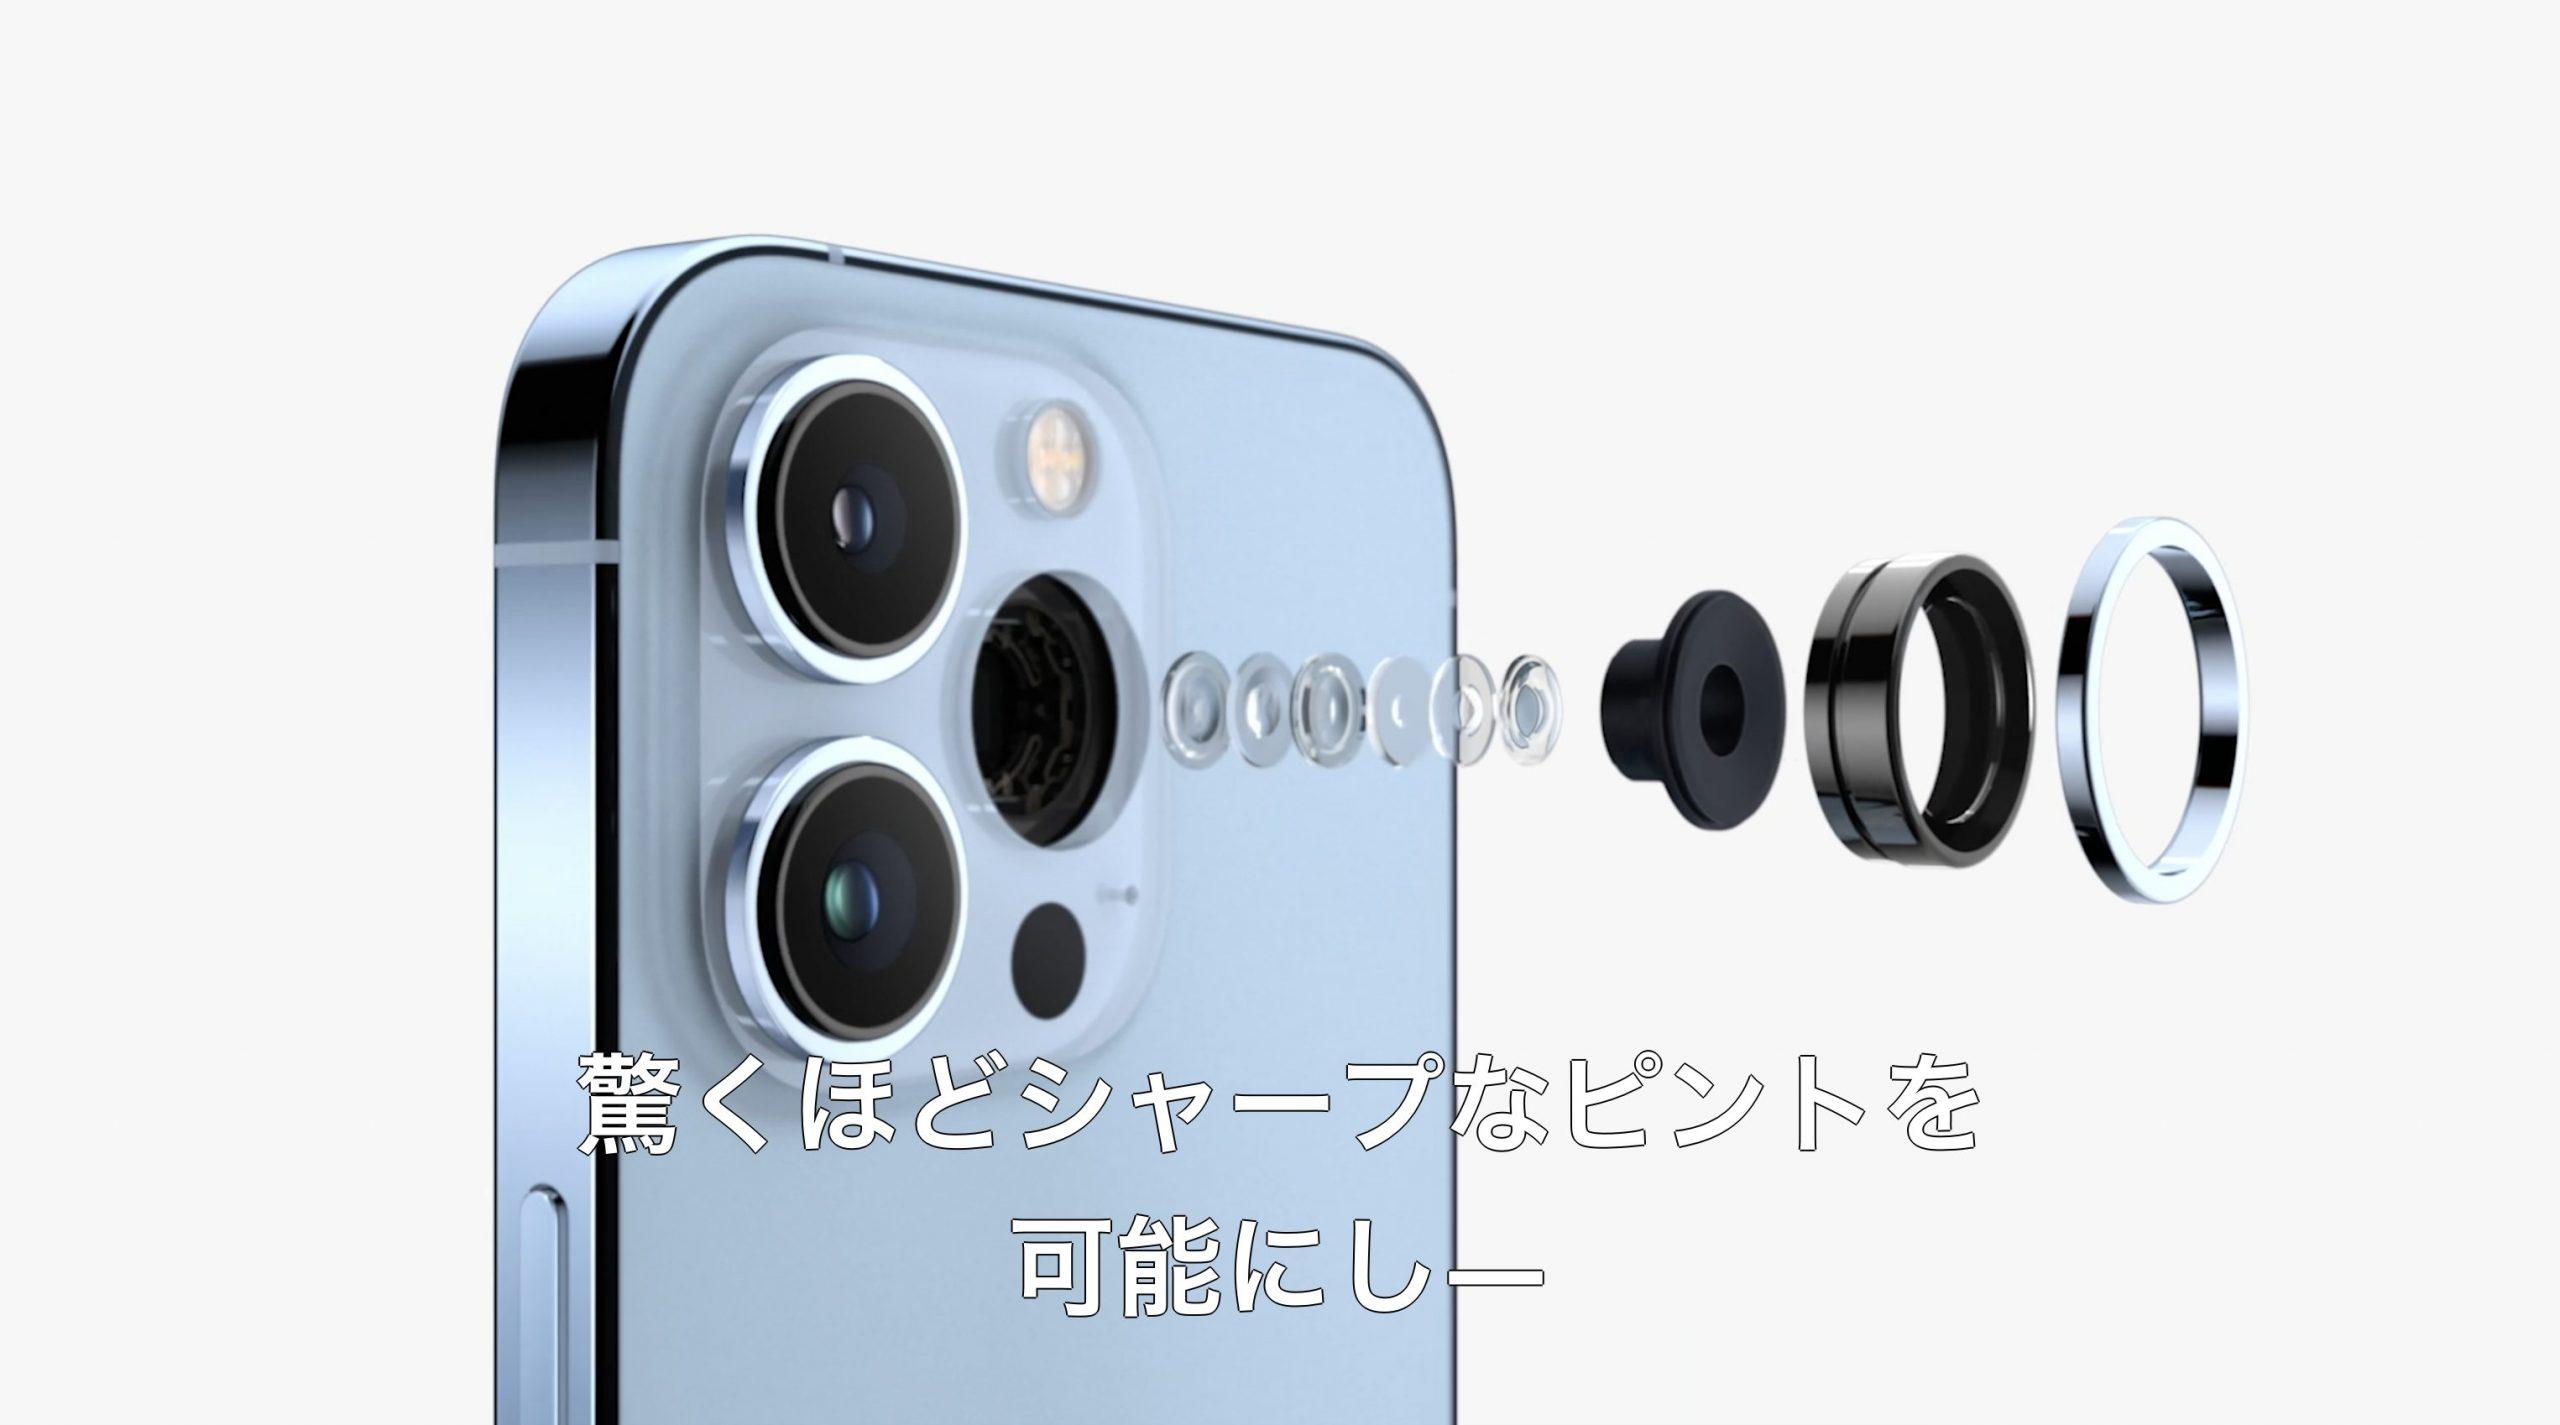 iPhone13 Proのカメラ